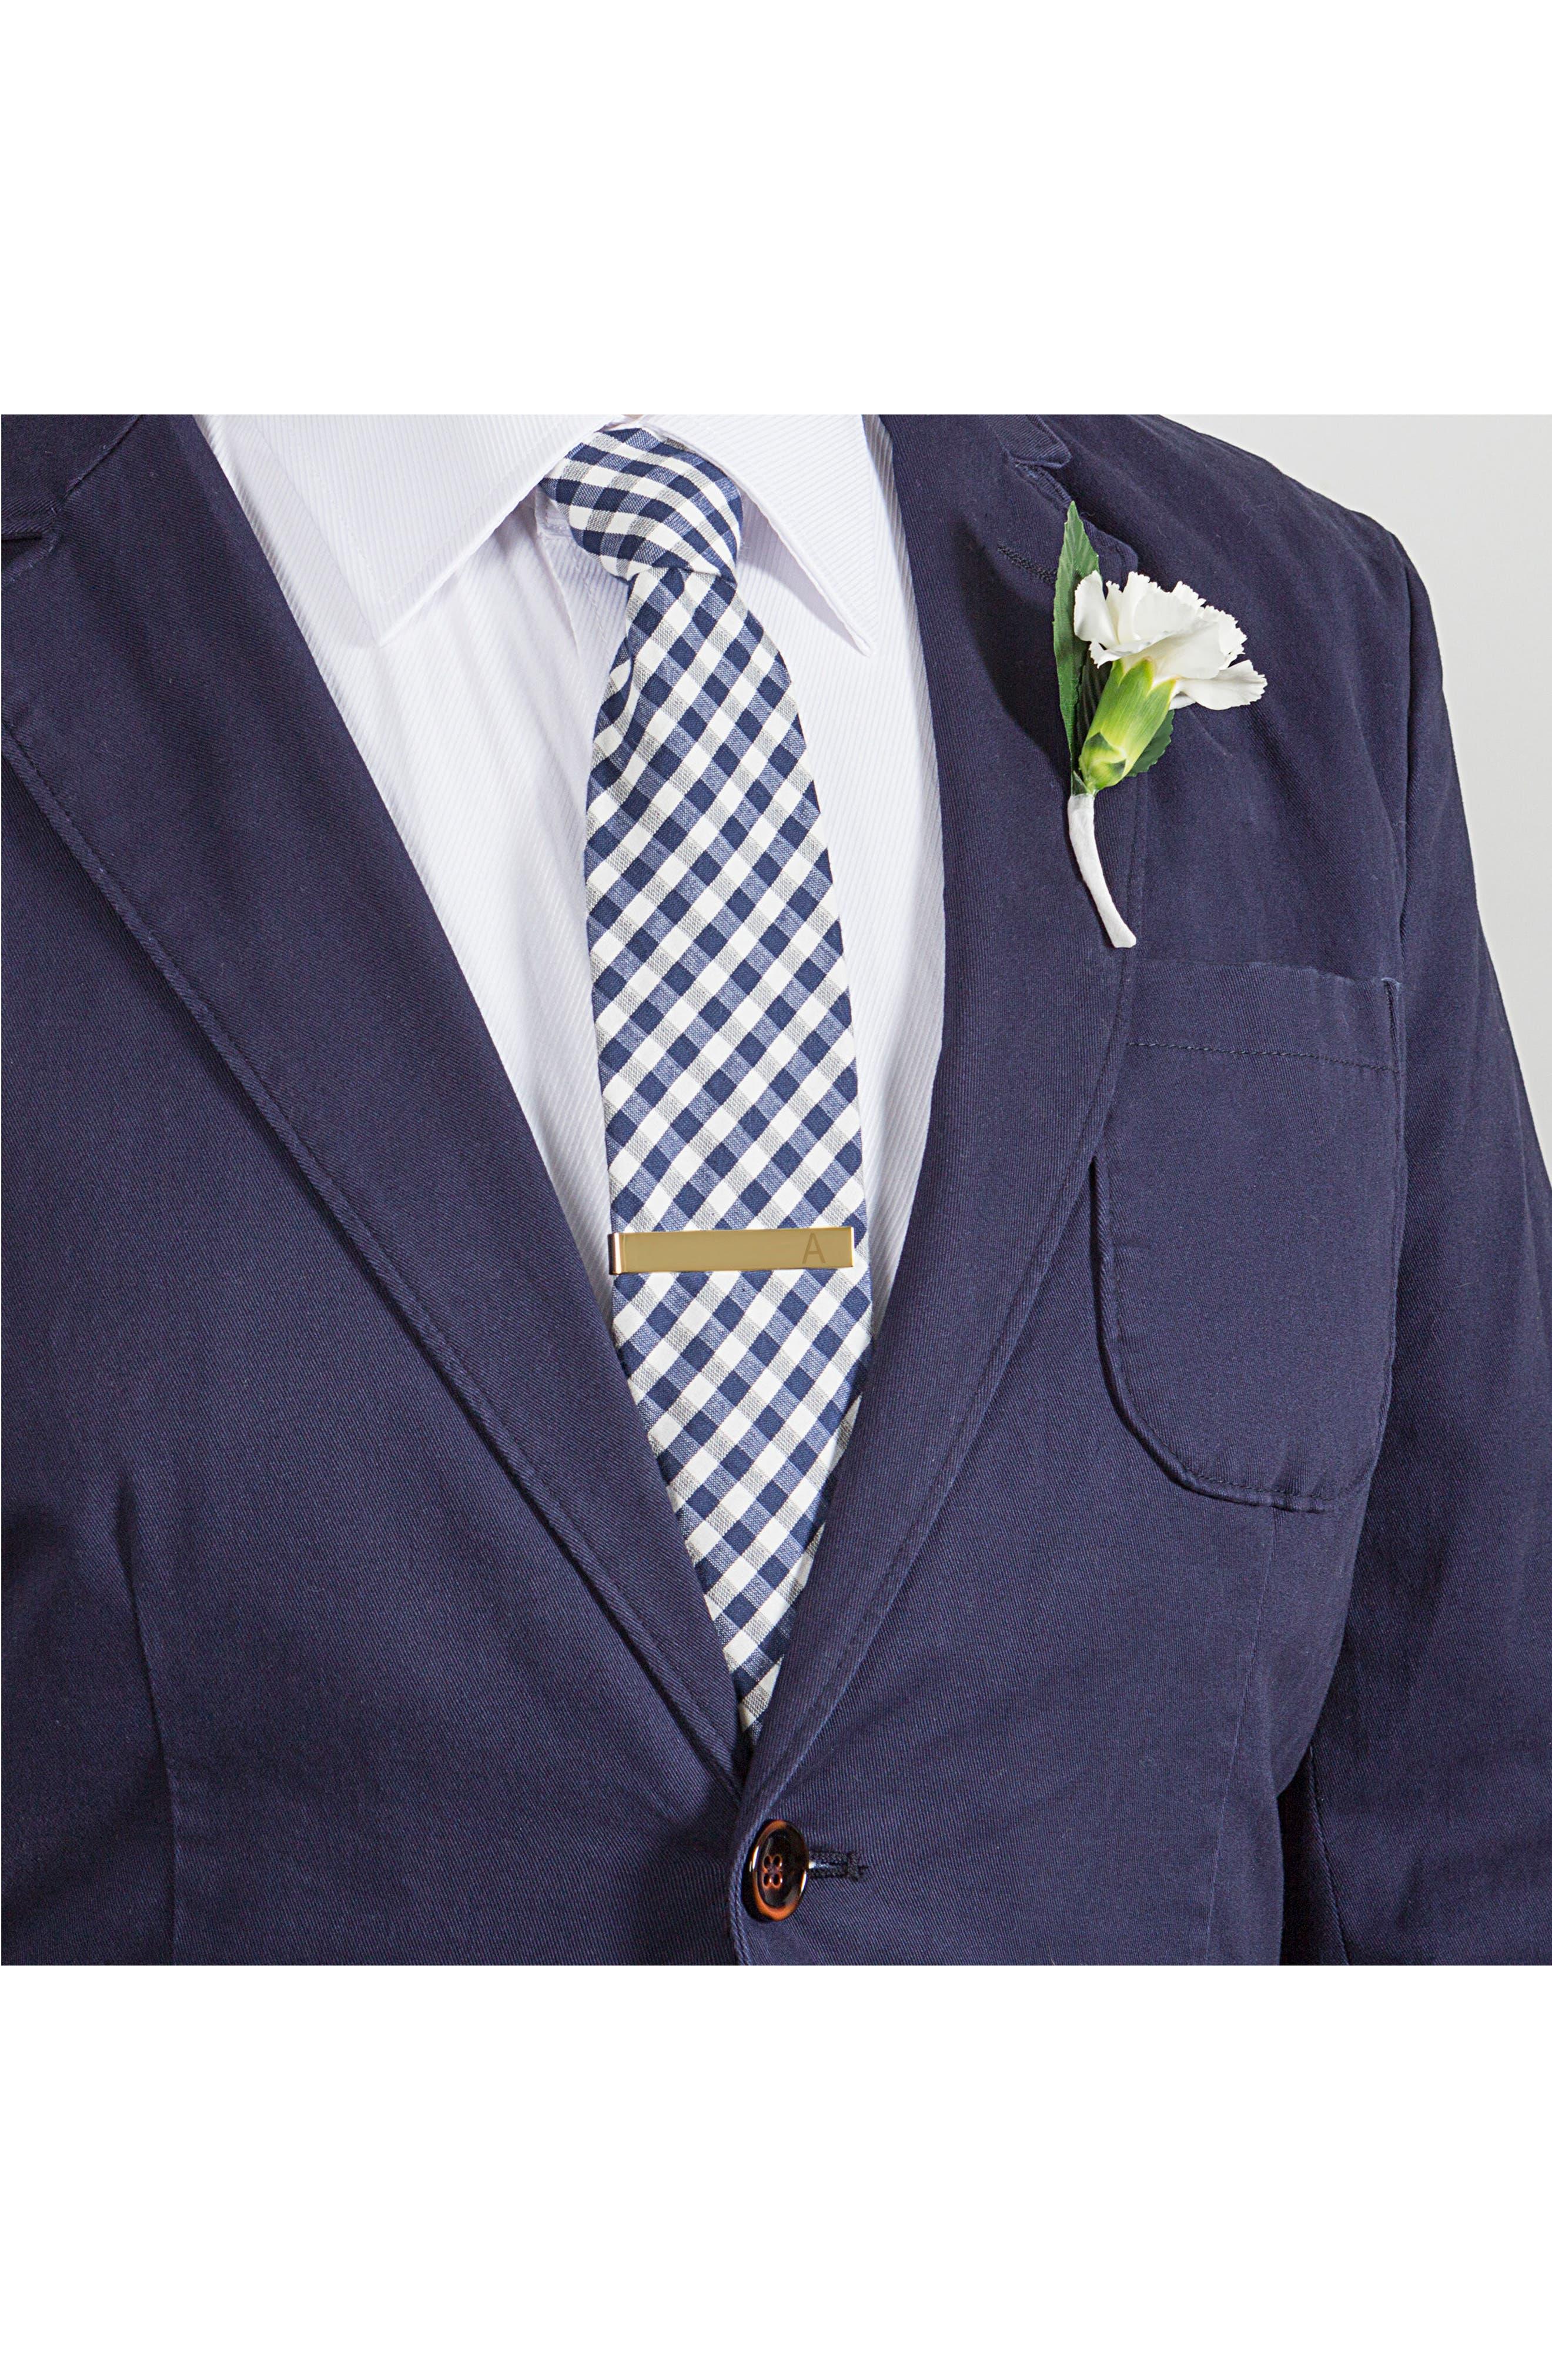 Monogram Tie Clip,                             Alternate thumbnail 2, color,